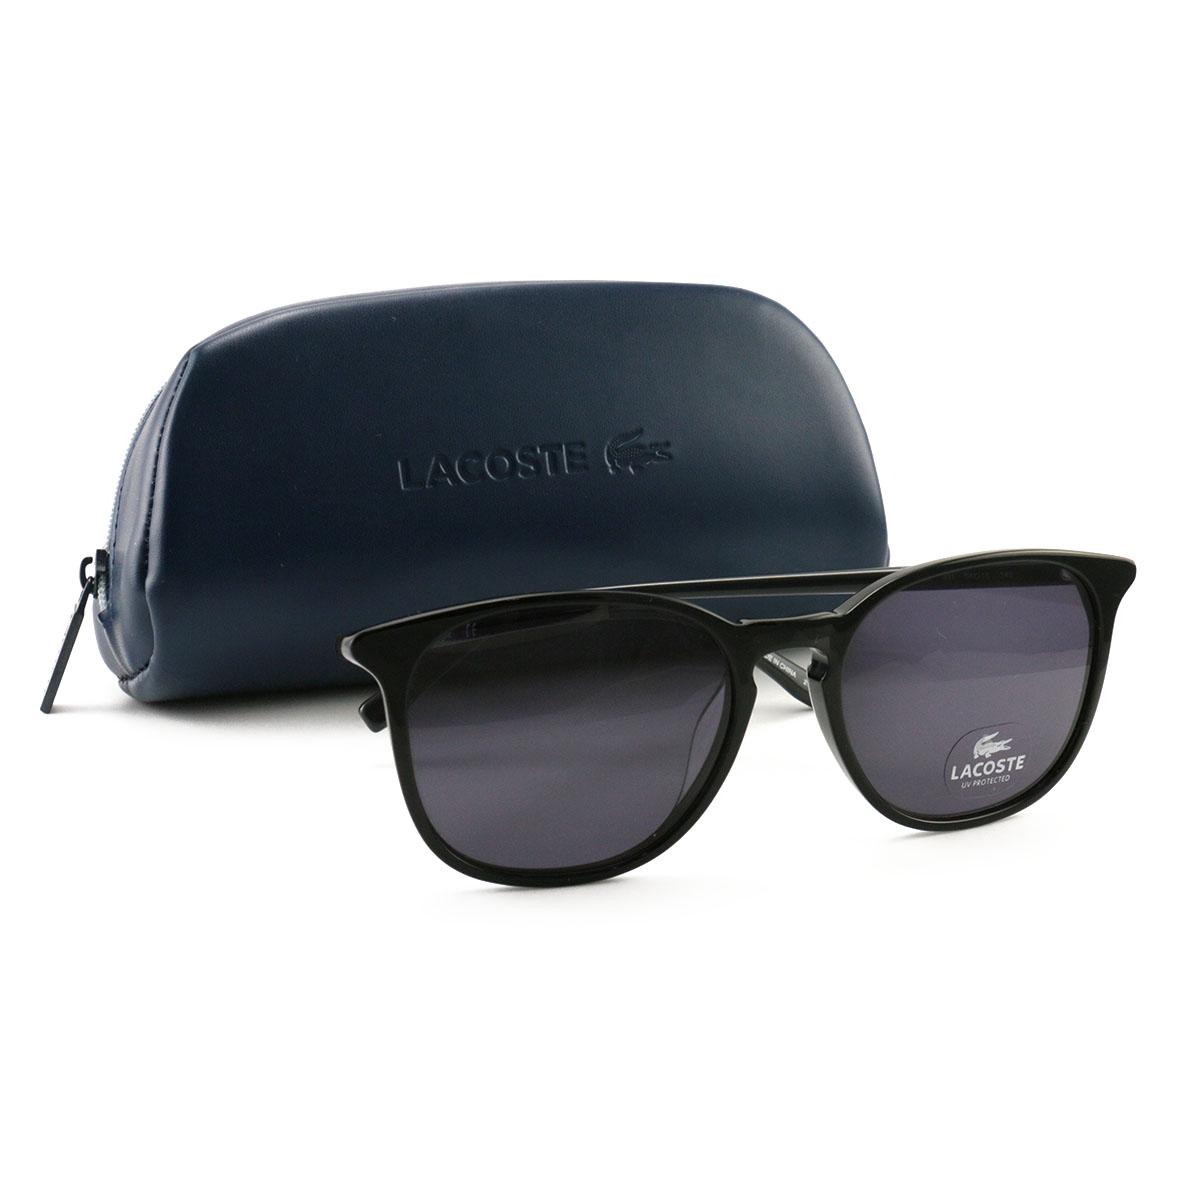 7362fac3d1fd Lacoste Sunglasses L813S 001 Black 54 18 140 886895245418